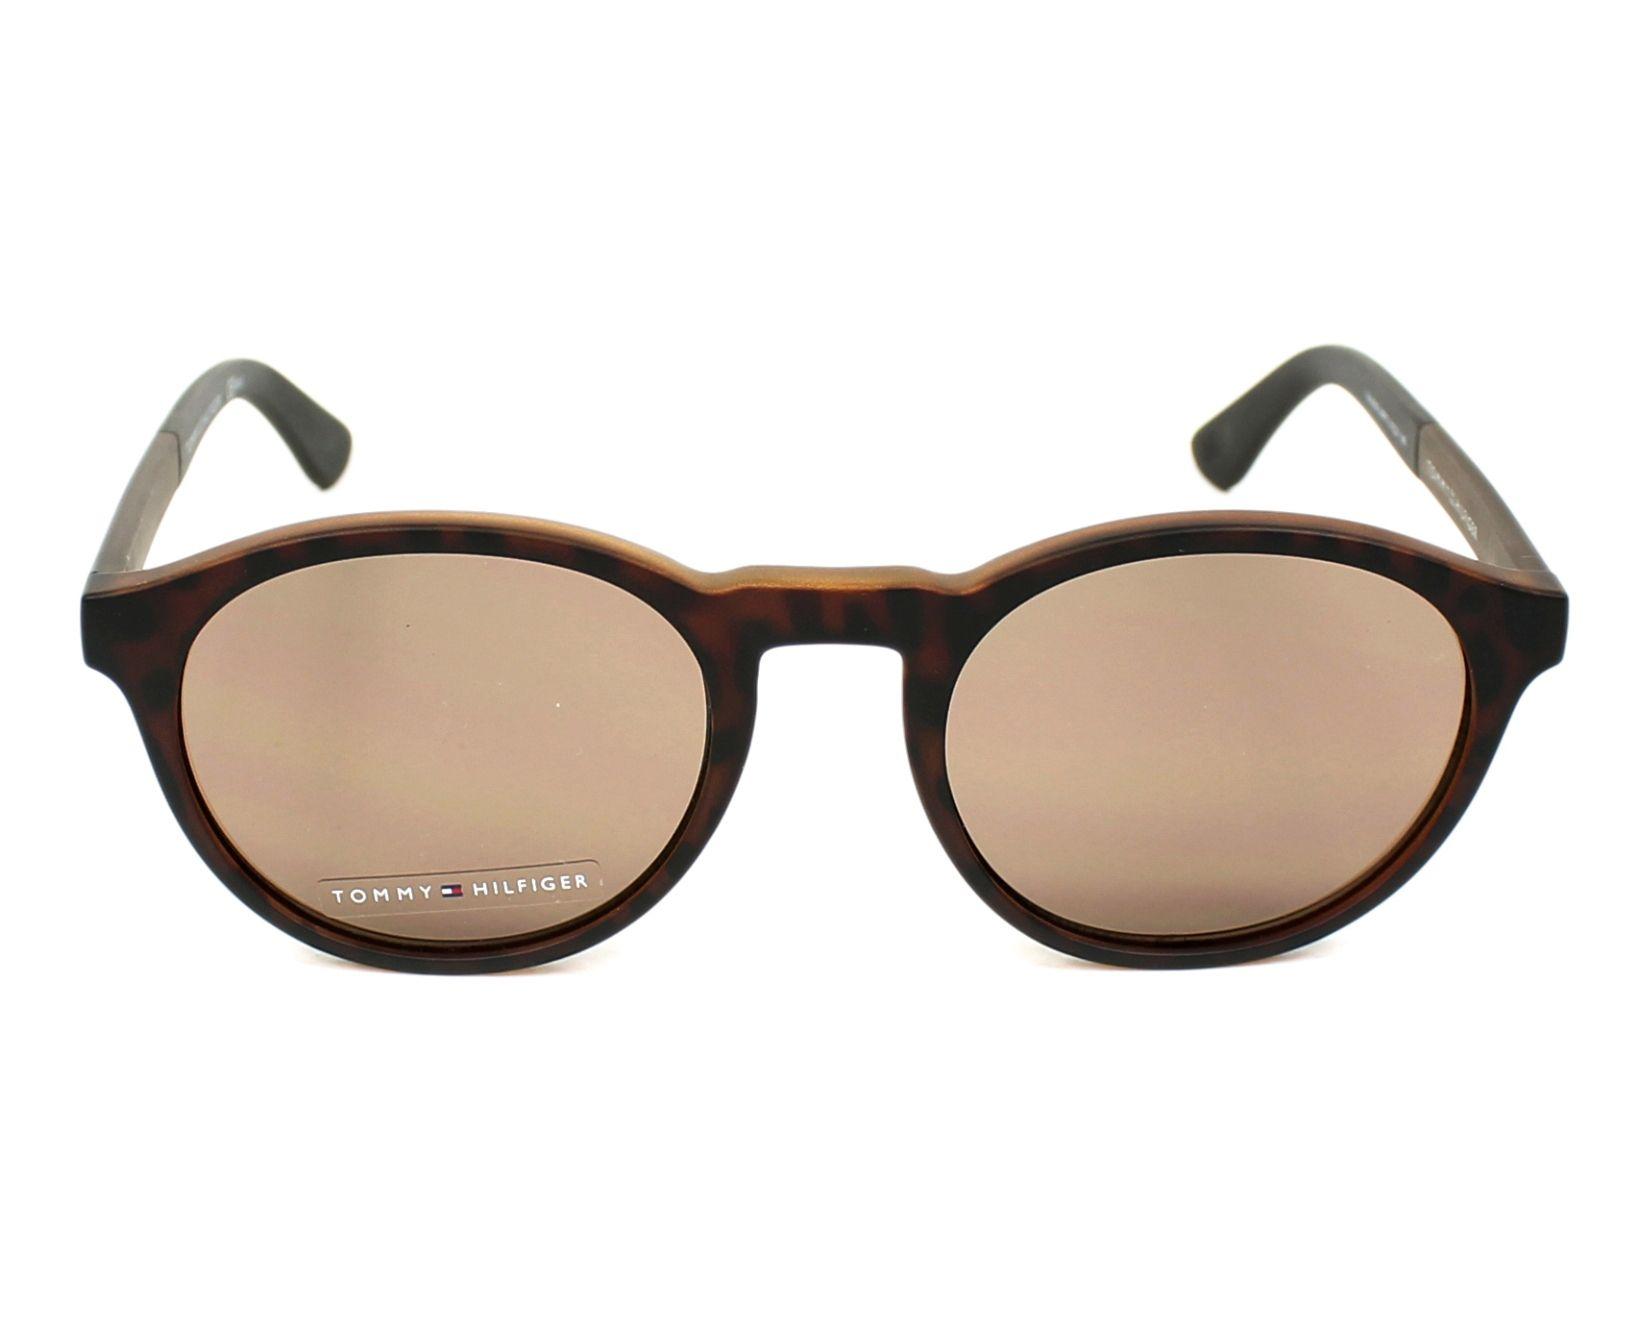 achat lunettes de soleil tommy hilfiger th 1476 s n9p 70 visionet. Black Bedroom Furniture Sets. Home Design Ideas